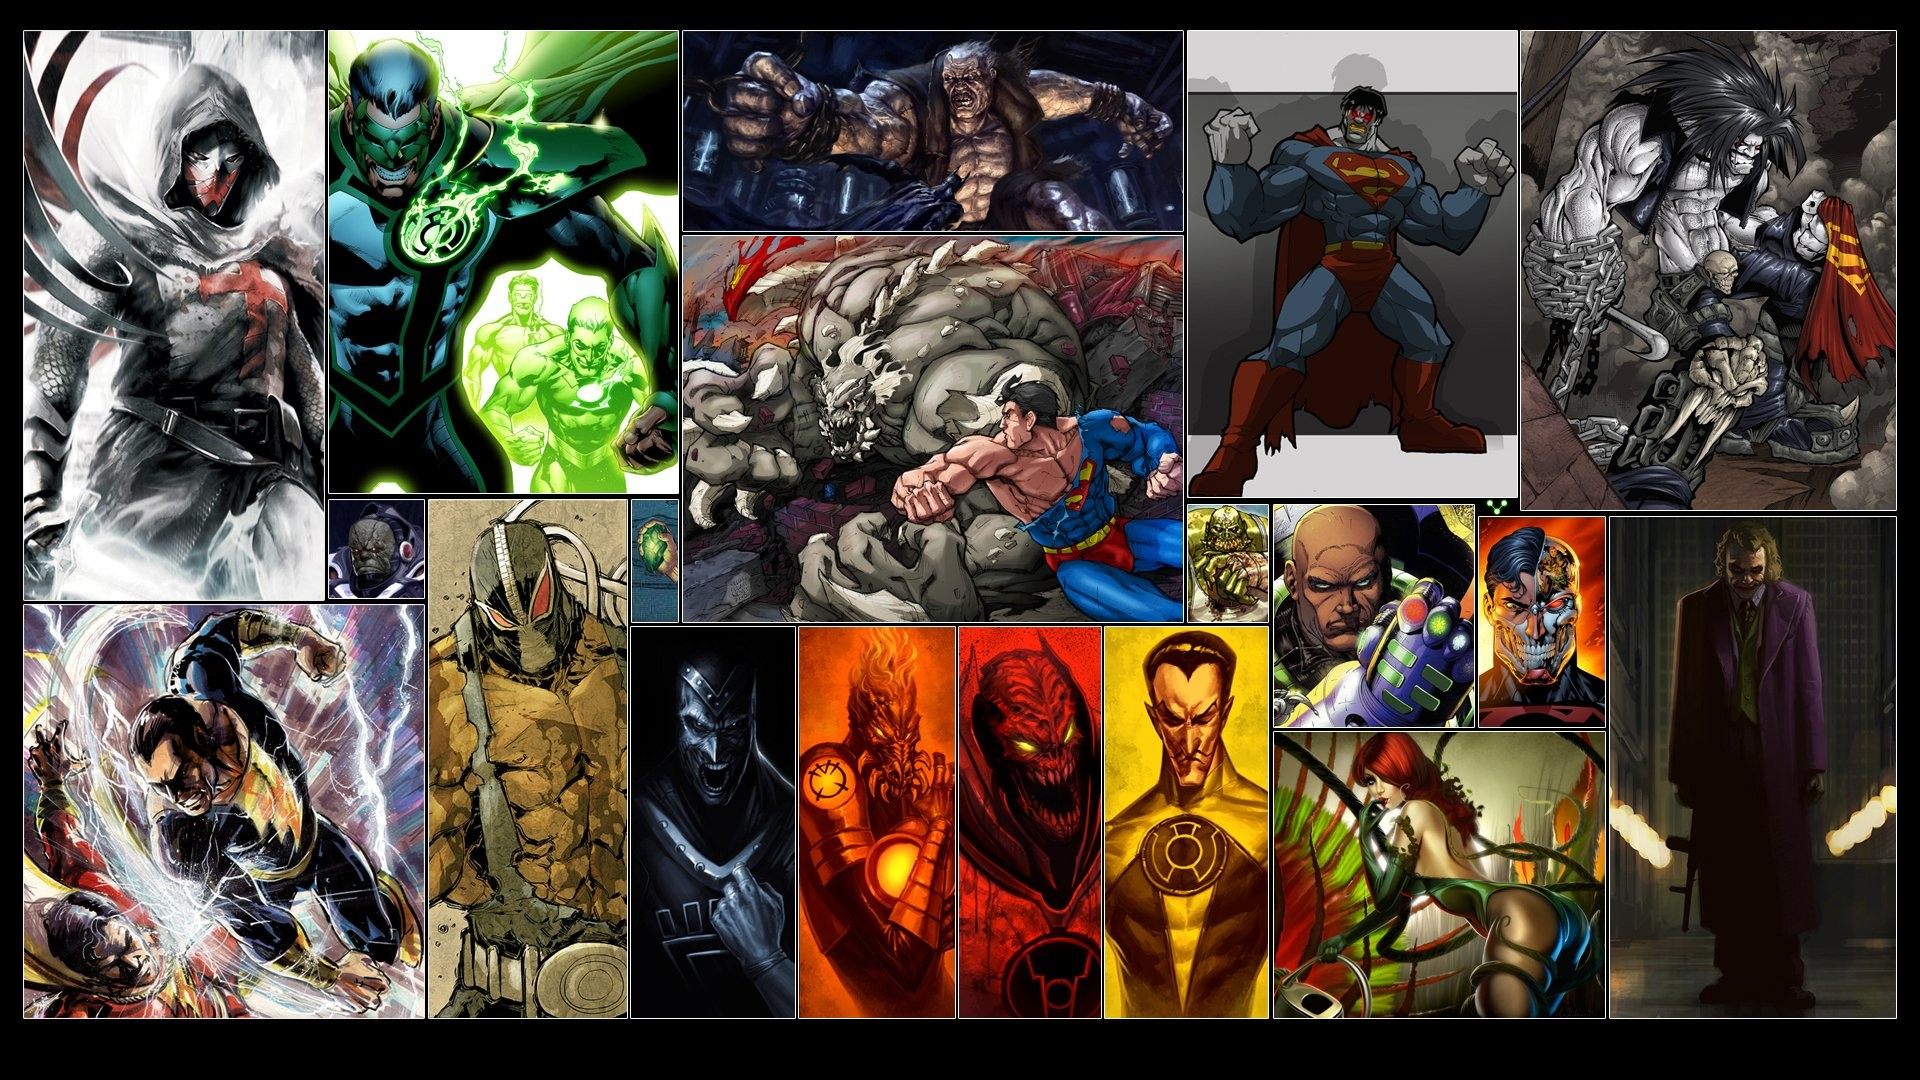 Comics – DC Comics Superman Joker Sinestro Red Lantern Wallpaper